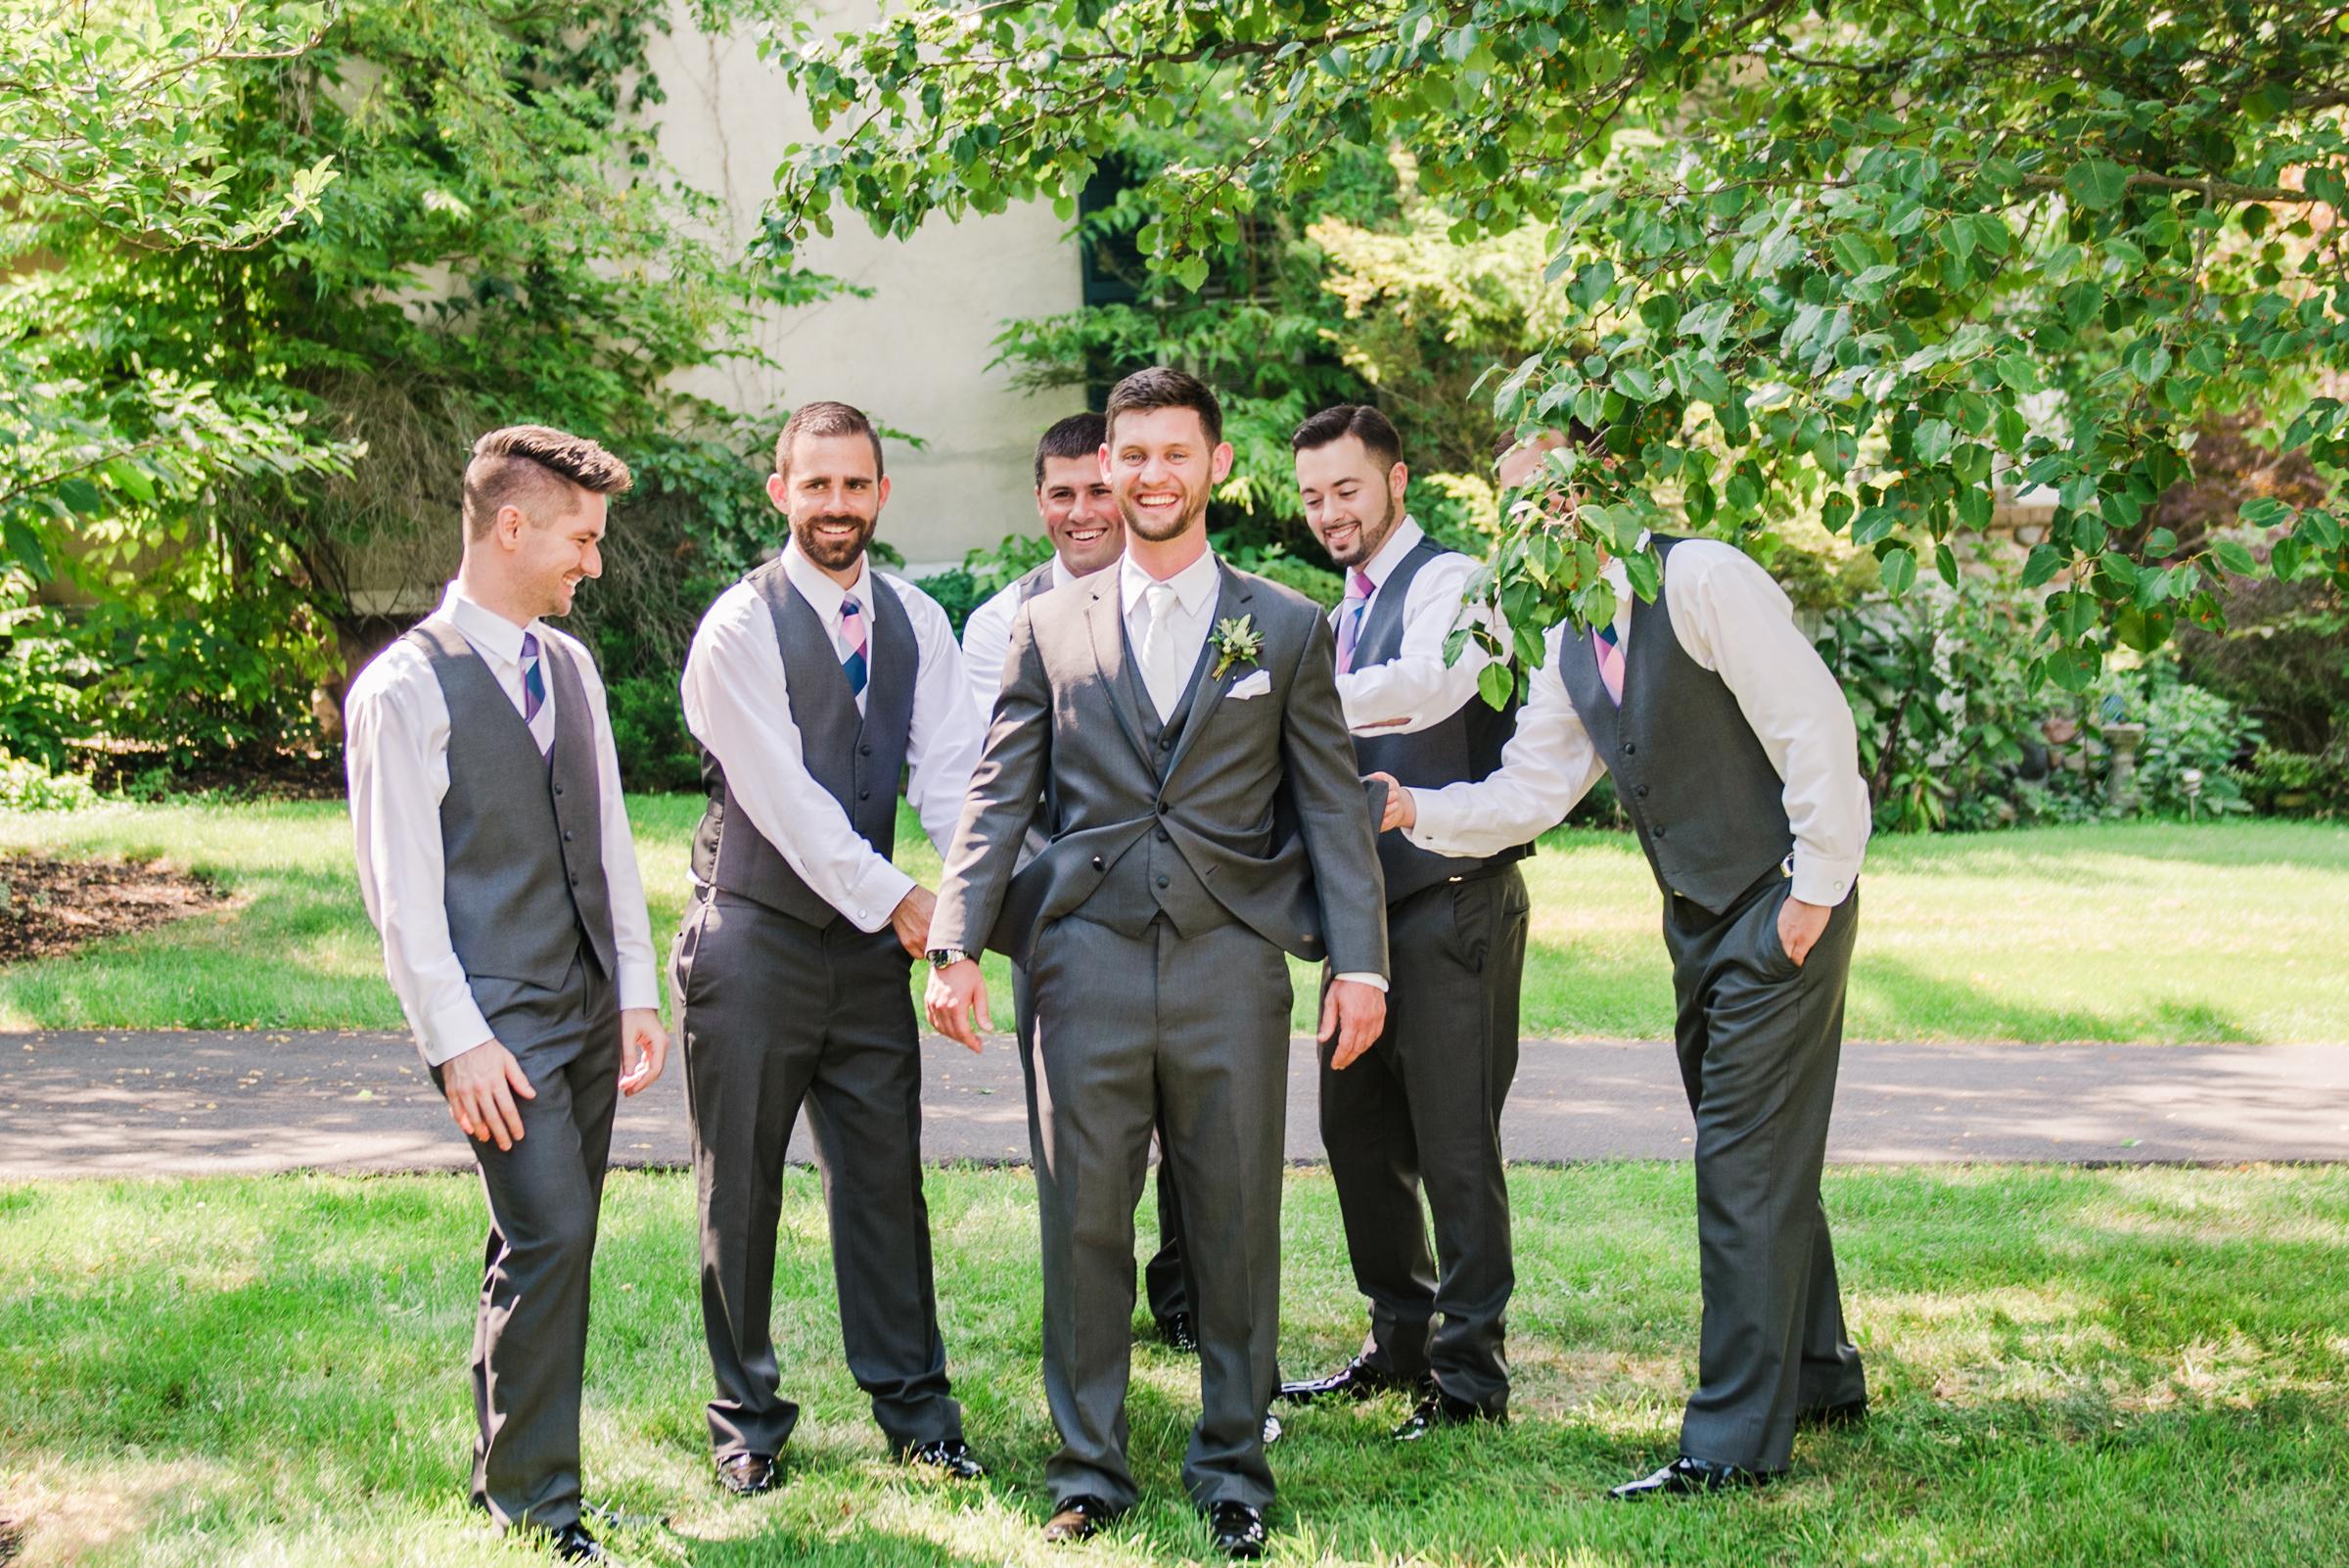 Jerris_Wadsworth_Wedding_Barn_Rochester_Wedding_JILL_STUDIO_Rochester_NY_Photographer_DSC_2389.jpg